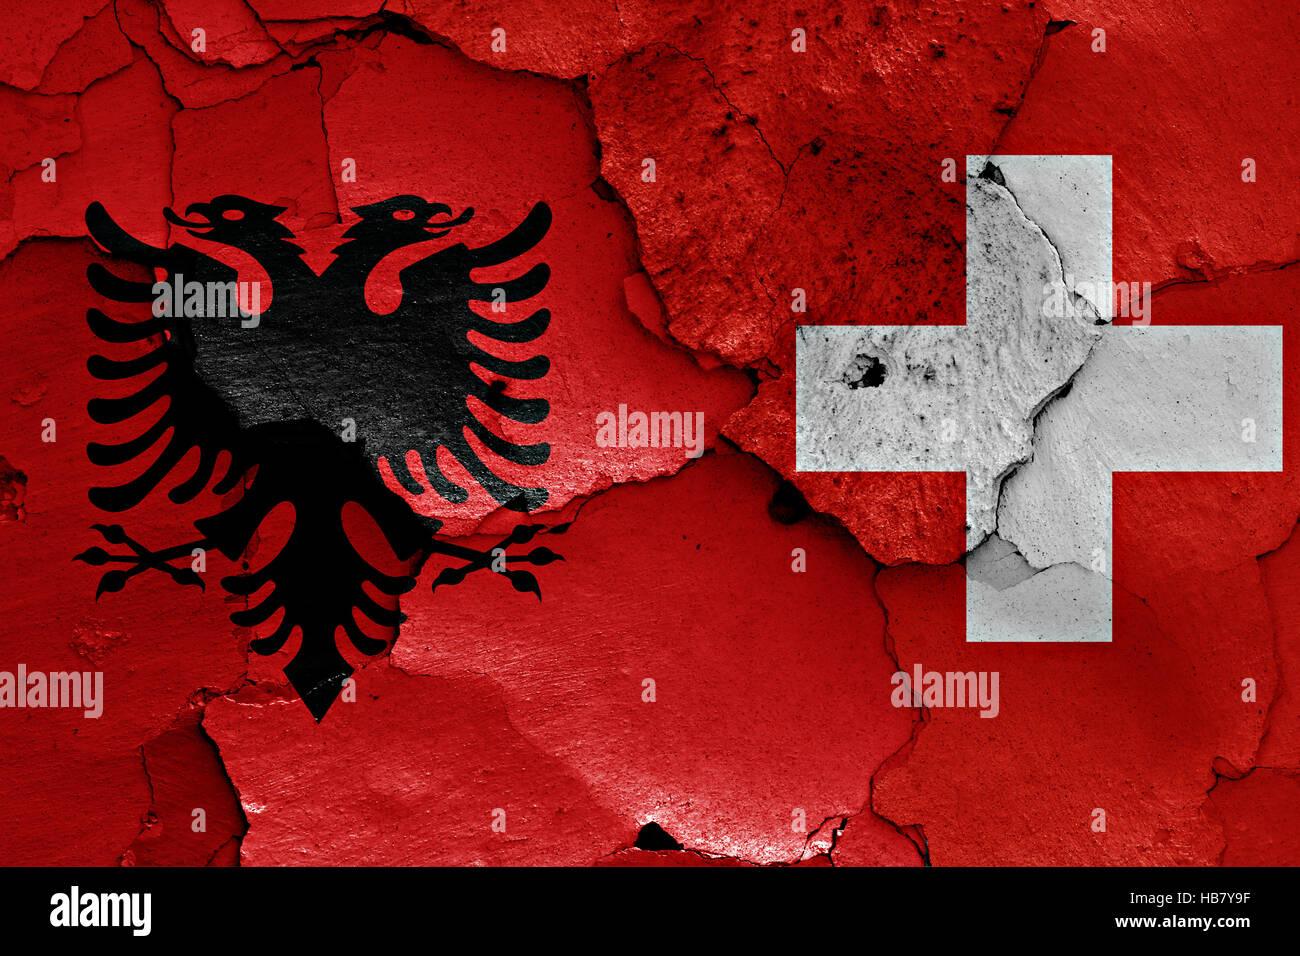 Albanien-Schweiz